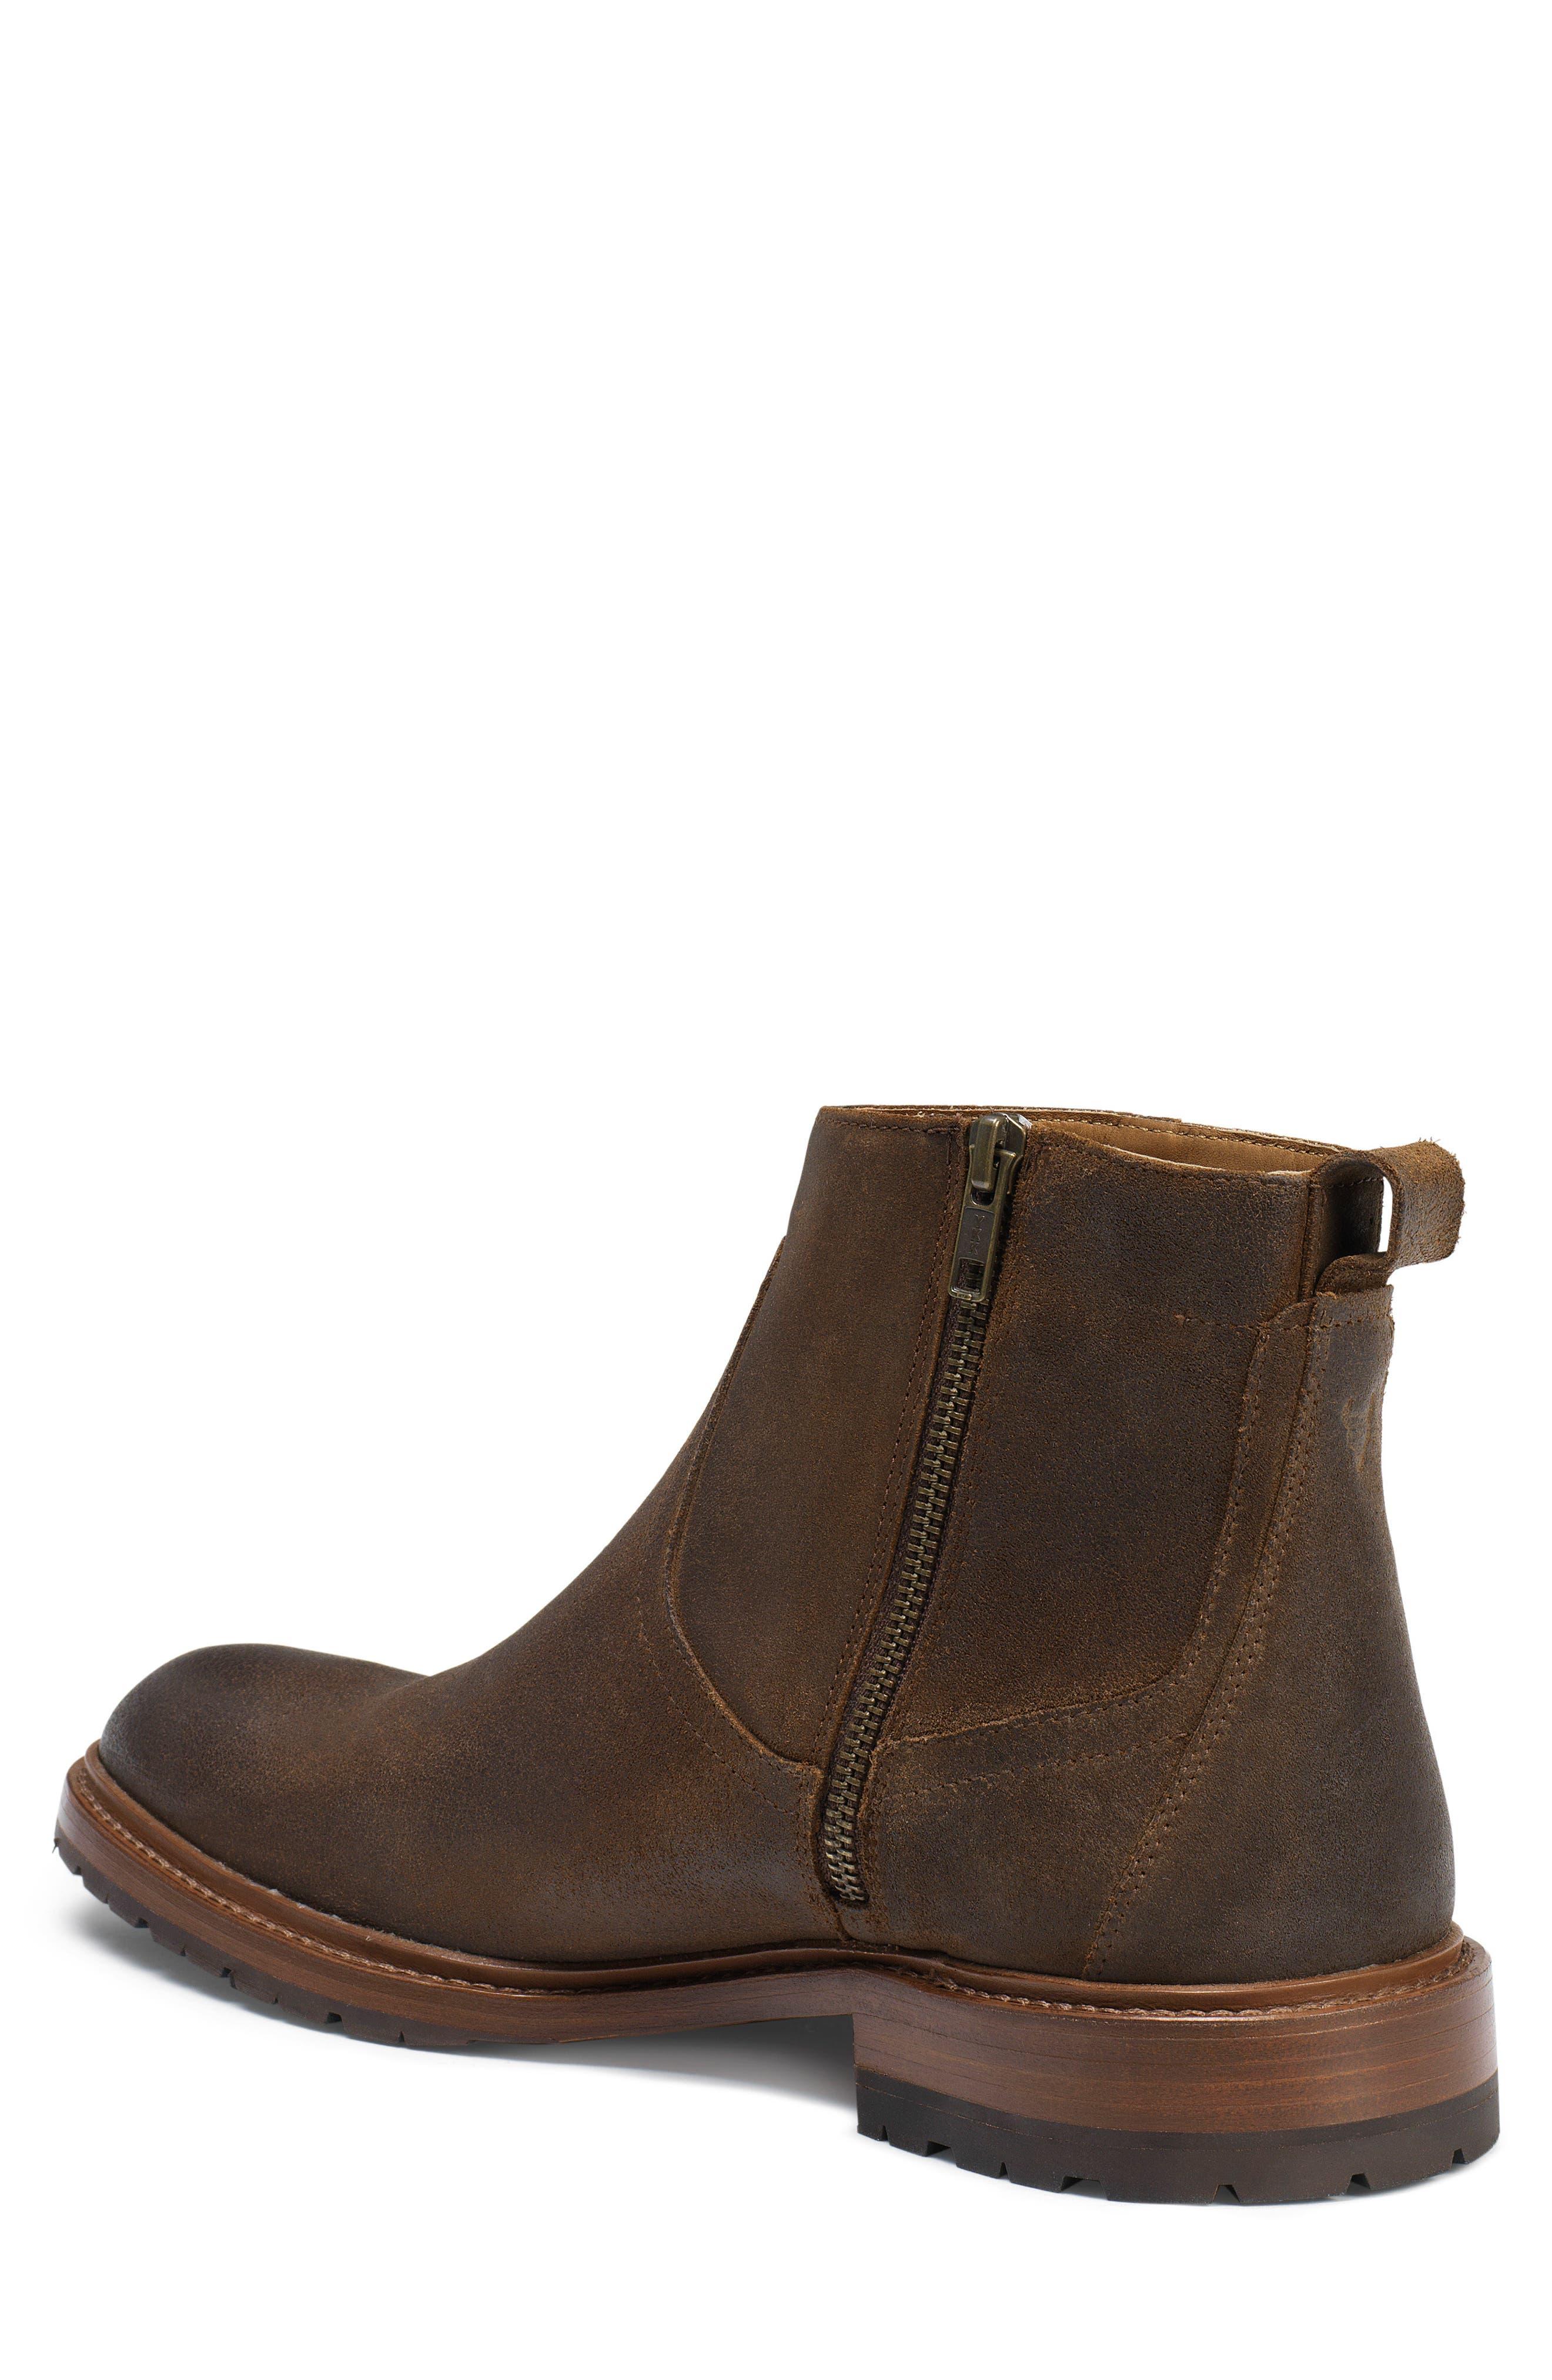 Larkin Zip Boot,                             Alternate thumbnail 2, color,                             Brown Waxed Suede